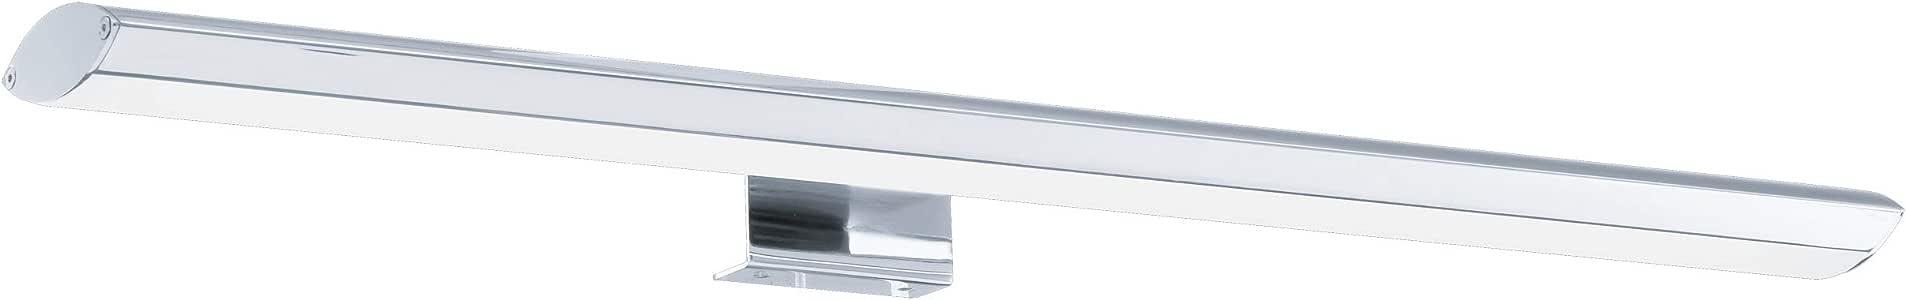 Eglo 53059 Ayna Ustu Aplik Led Stripe 8, 25W 5300K 600L